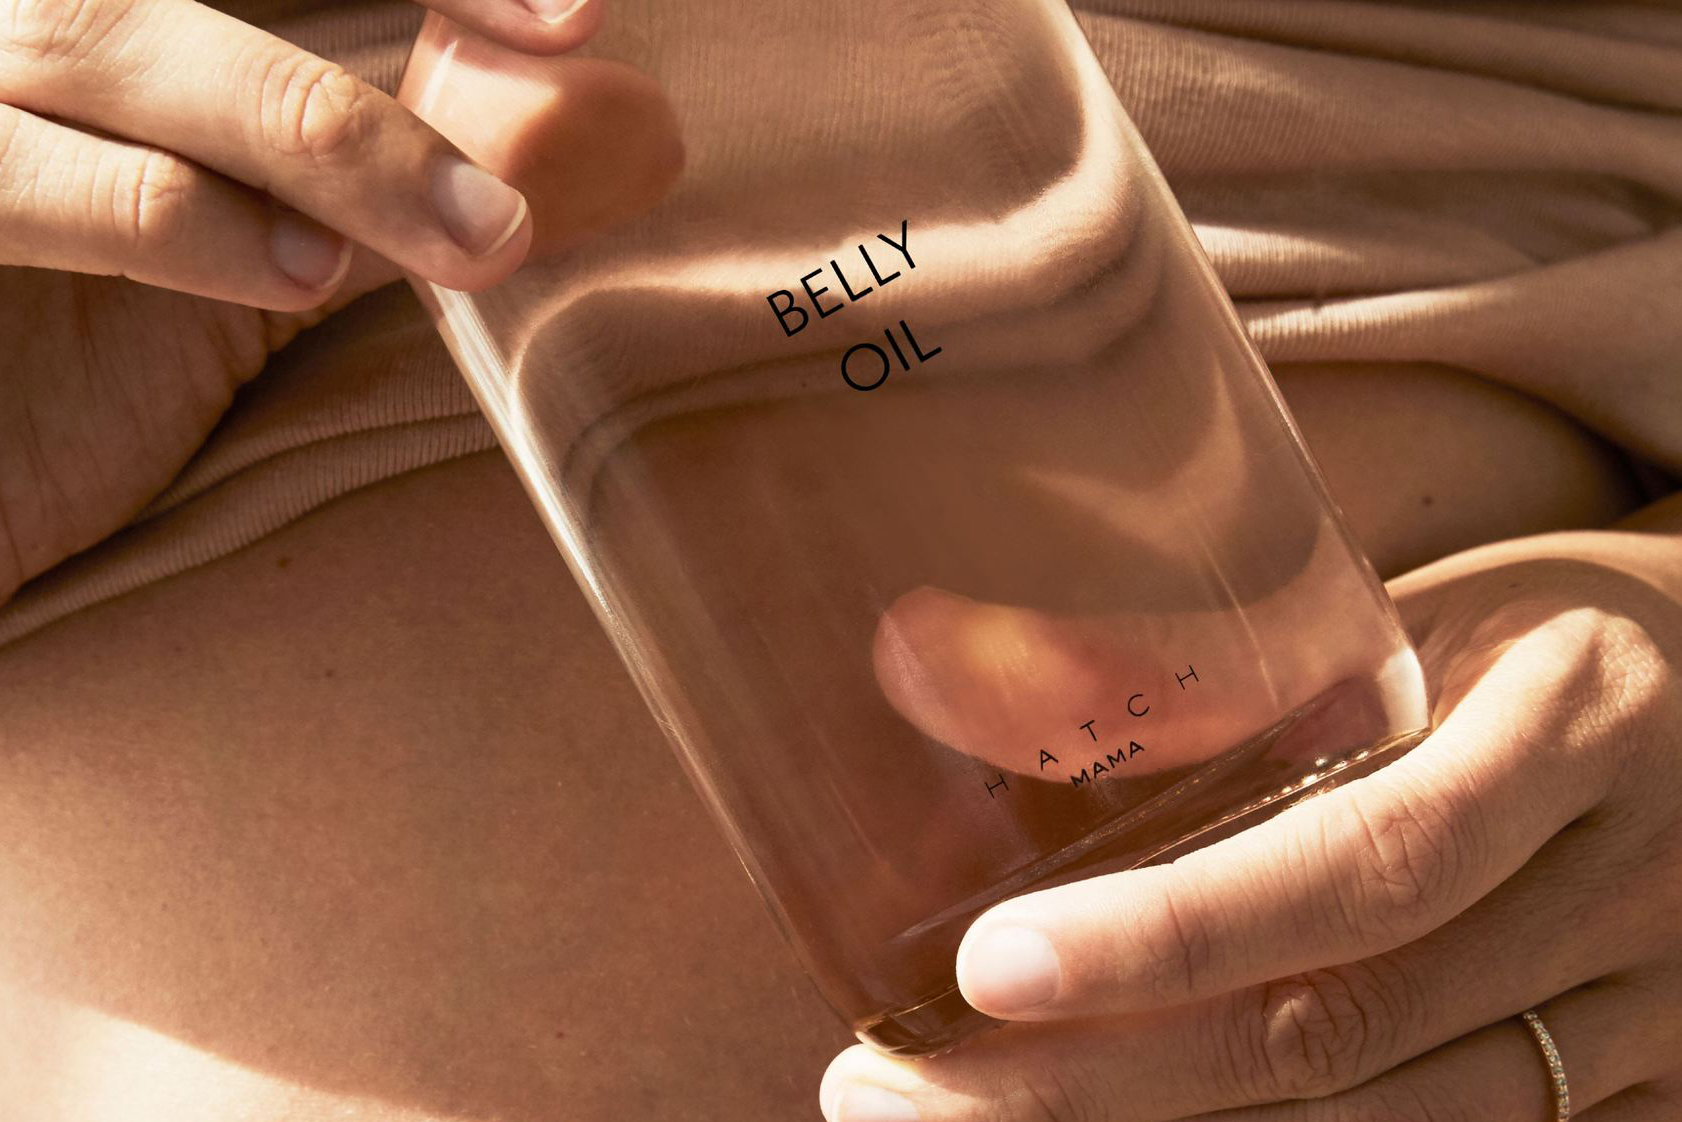 belly oil